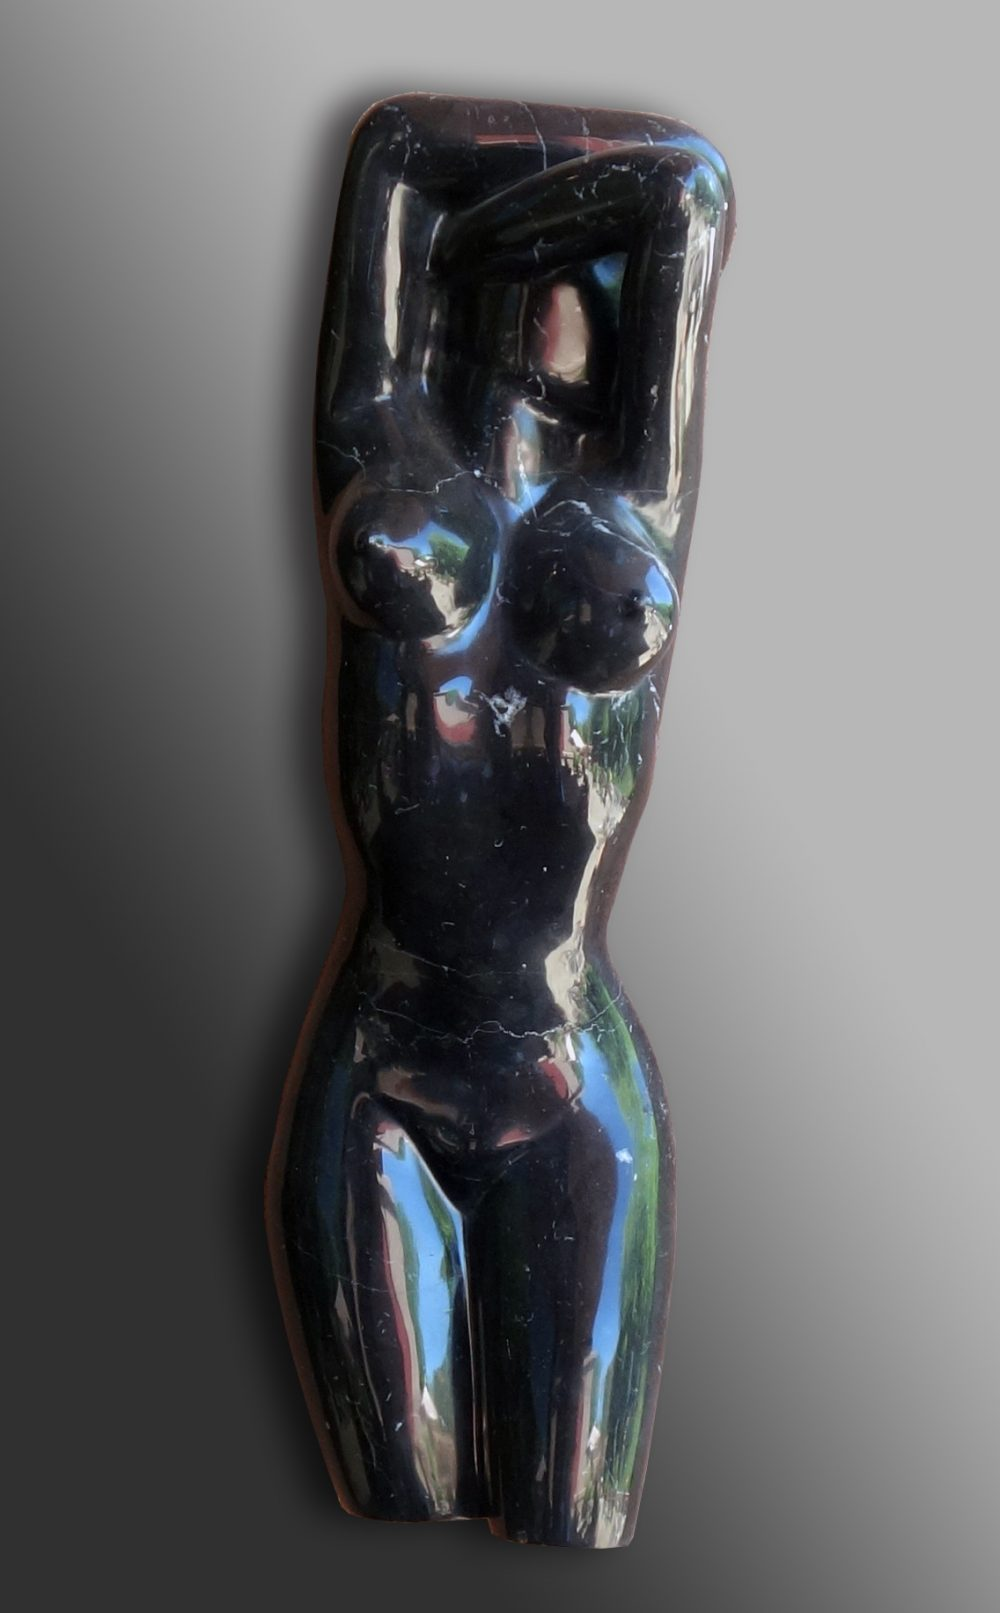 Dreams | Daniel Newman | Sculpture-Exposures International Gallery of Fine Art - Sedona AZ